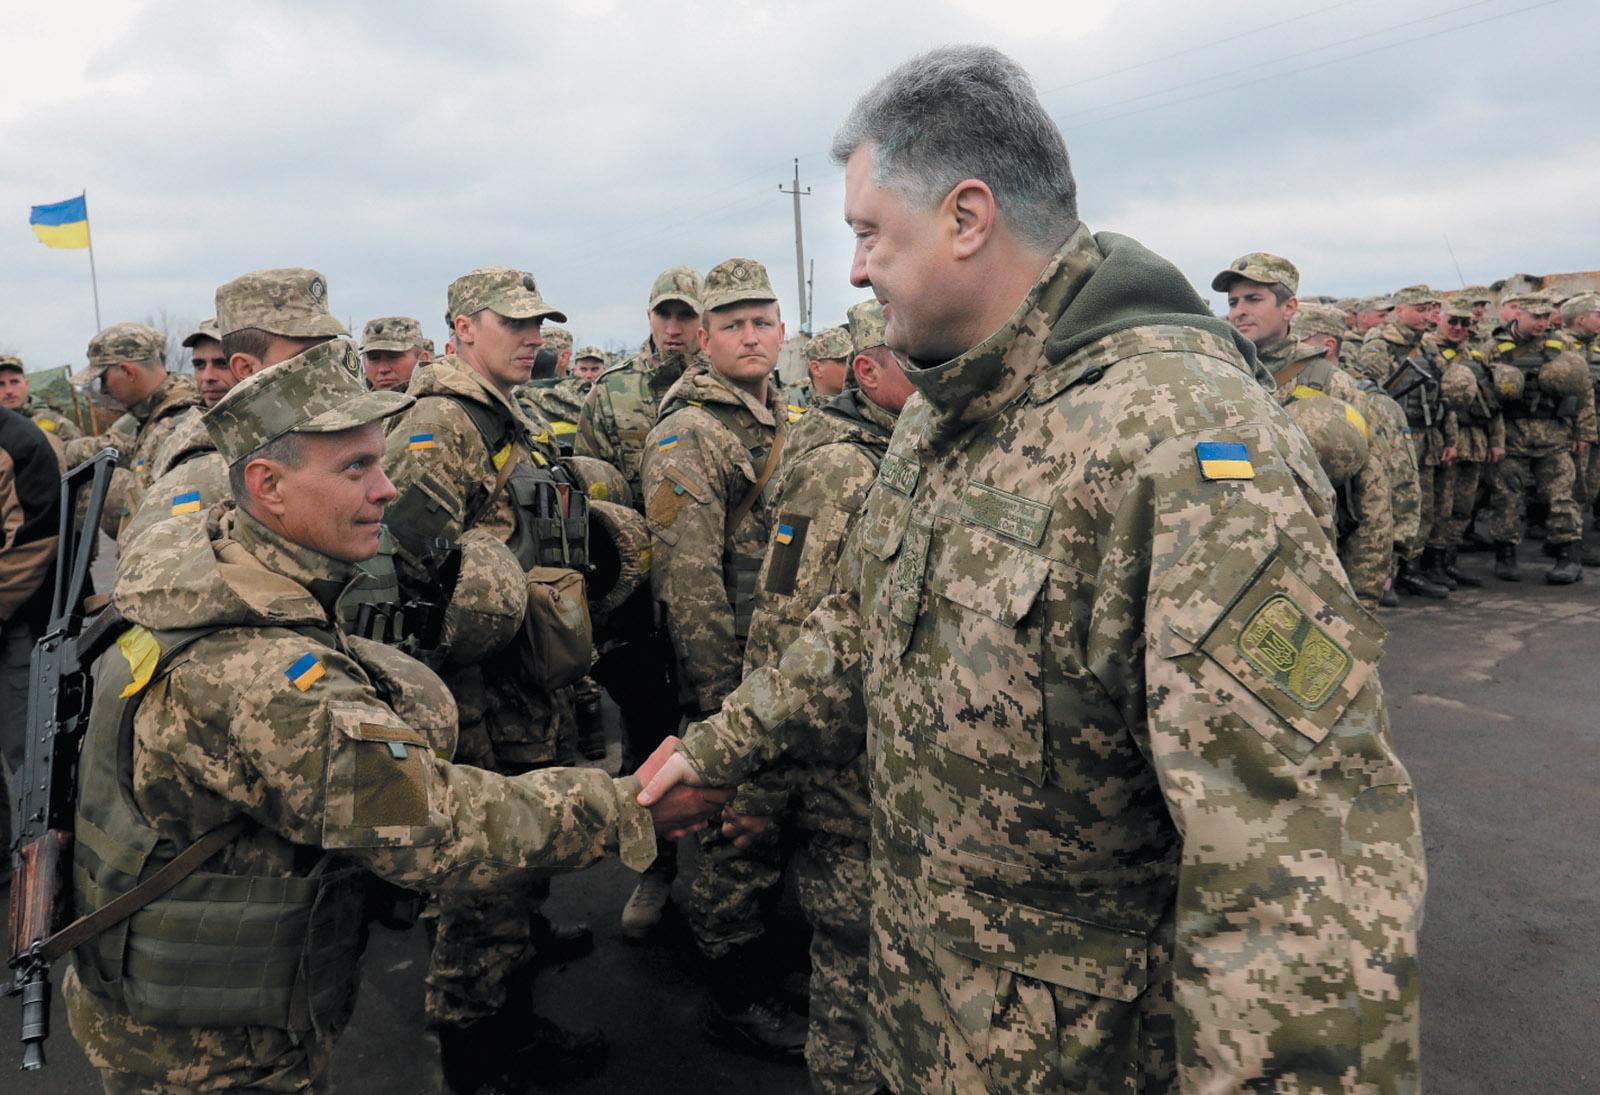 President Petro Poroshenko with soldiers in the Luhansk region of eastern Ukraine, April 2017